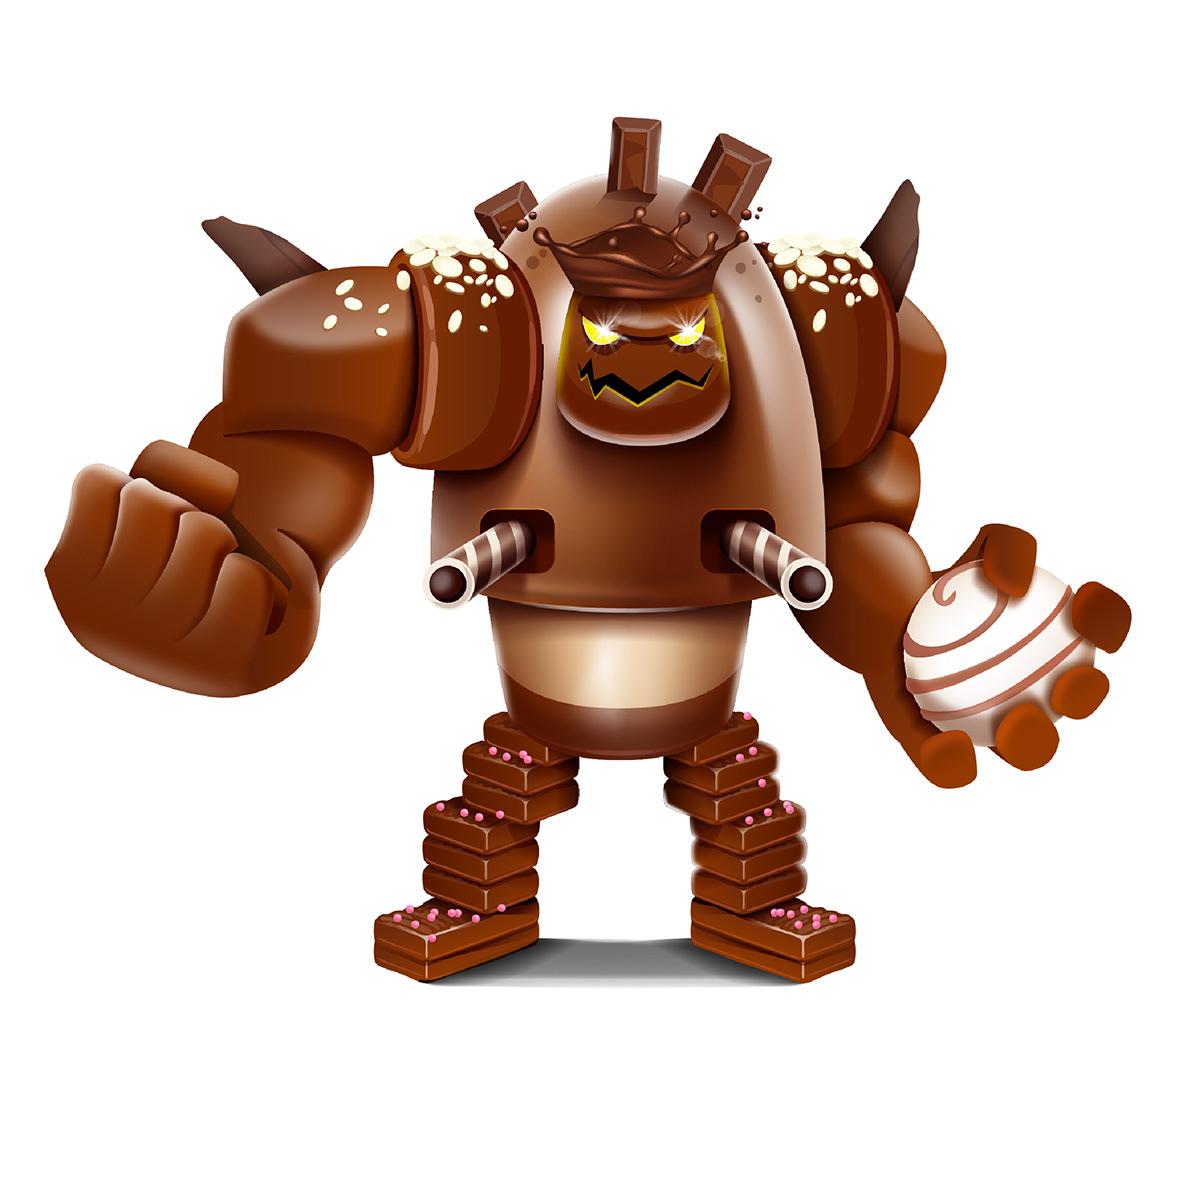 Bear character Candy character Chocolate Monster hero character Horse sea monster Muslim Kids PIRATE MAN serag basel سراج باسل